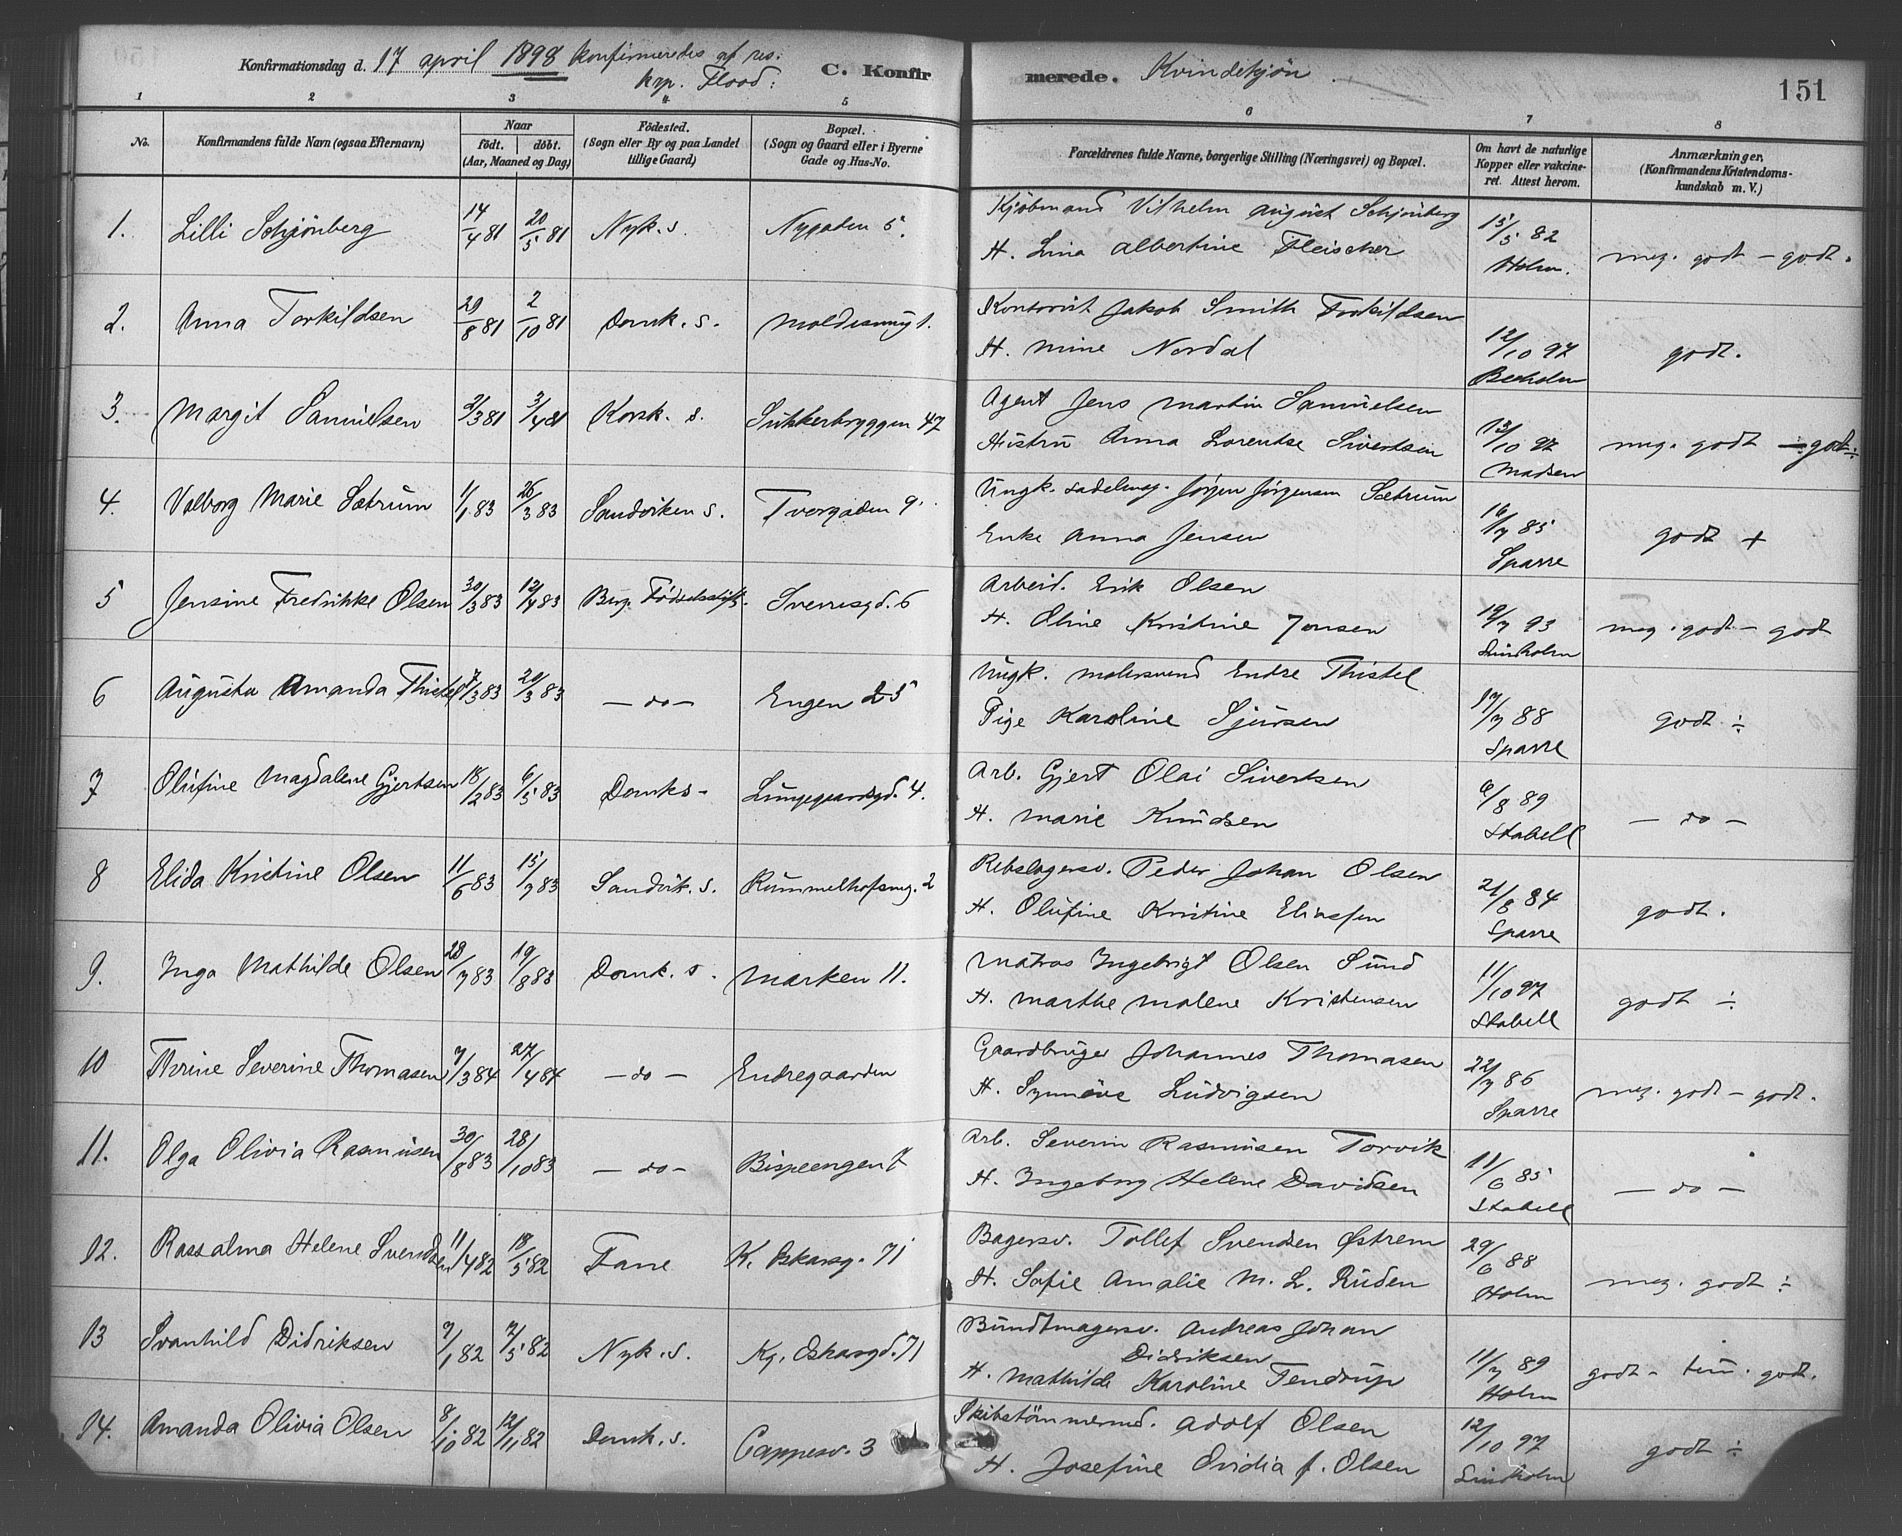 SAB, Domkirken Sokneprestembete, H/Haa/L0030: Ministerialbok nr. C 5, 1880-1898, s. 151